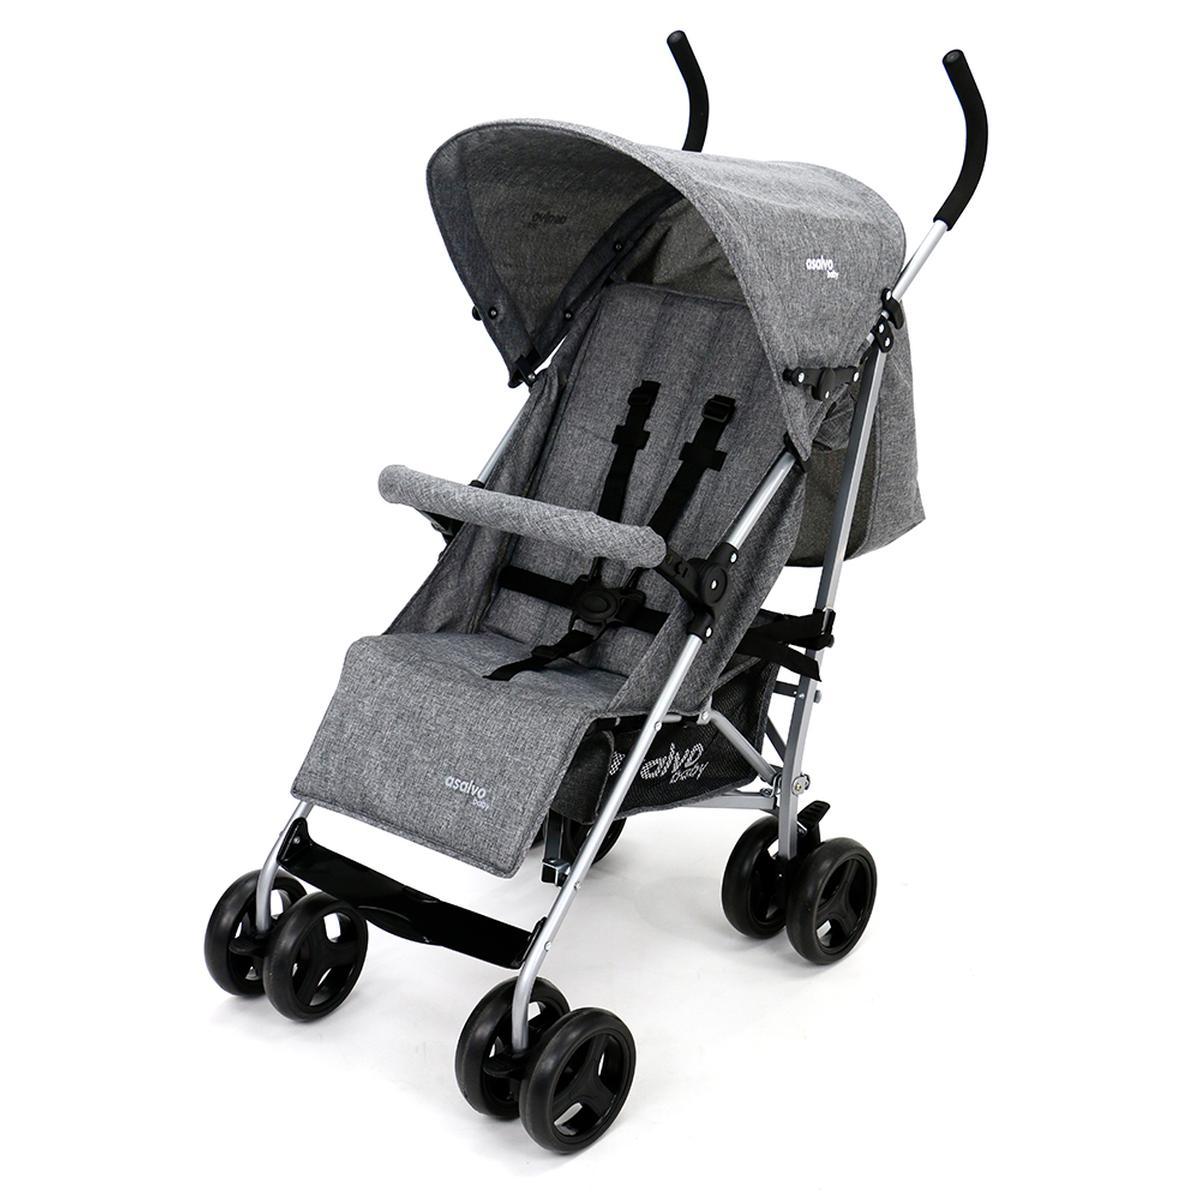 color Beige Silla de paseo Asalvo Yolo cochecito de bebé silla ligera